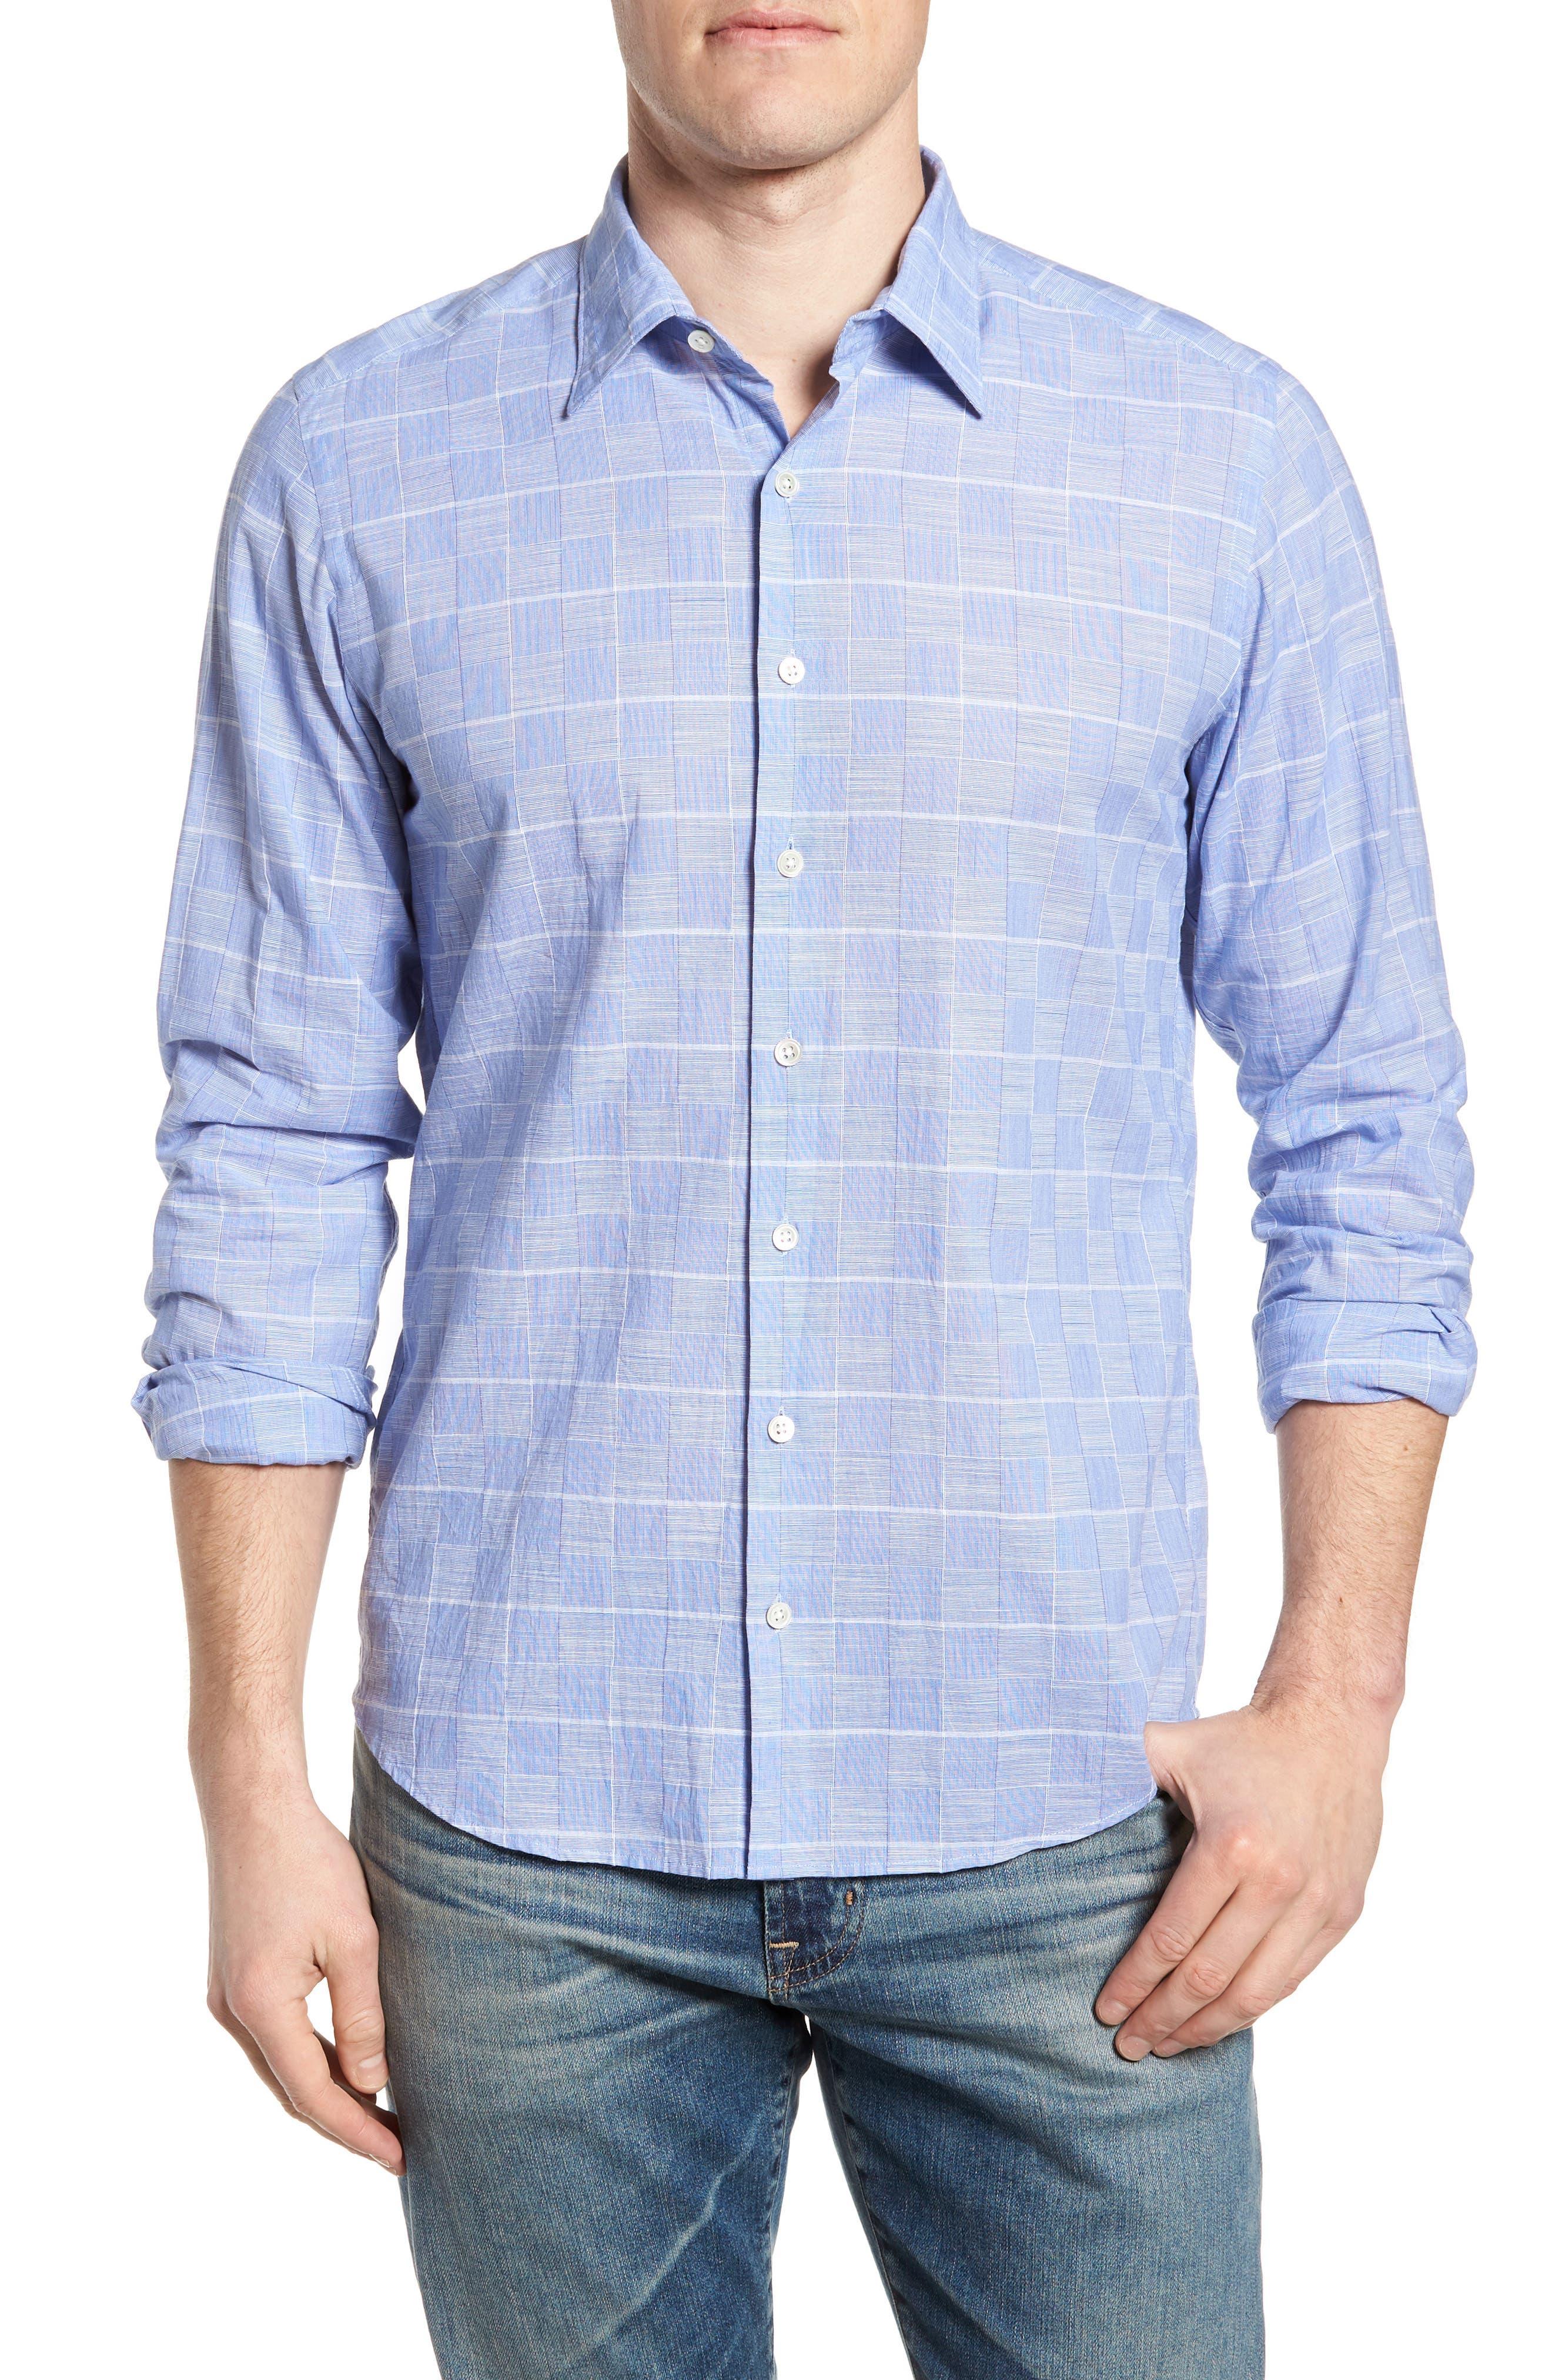 Tussock Creek Regular Fit Check Sport Shirt,                             Main thumbnail 1, color,                             Azure